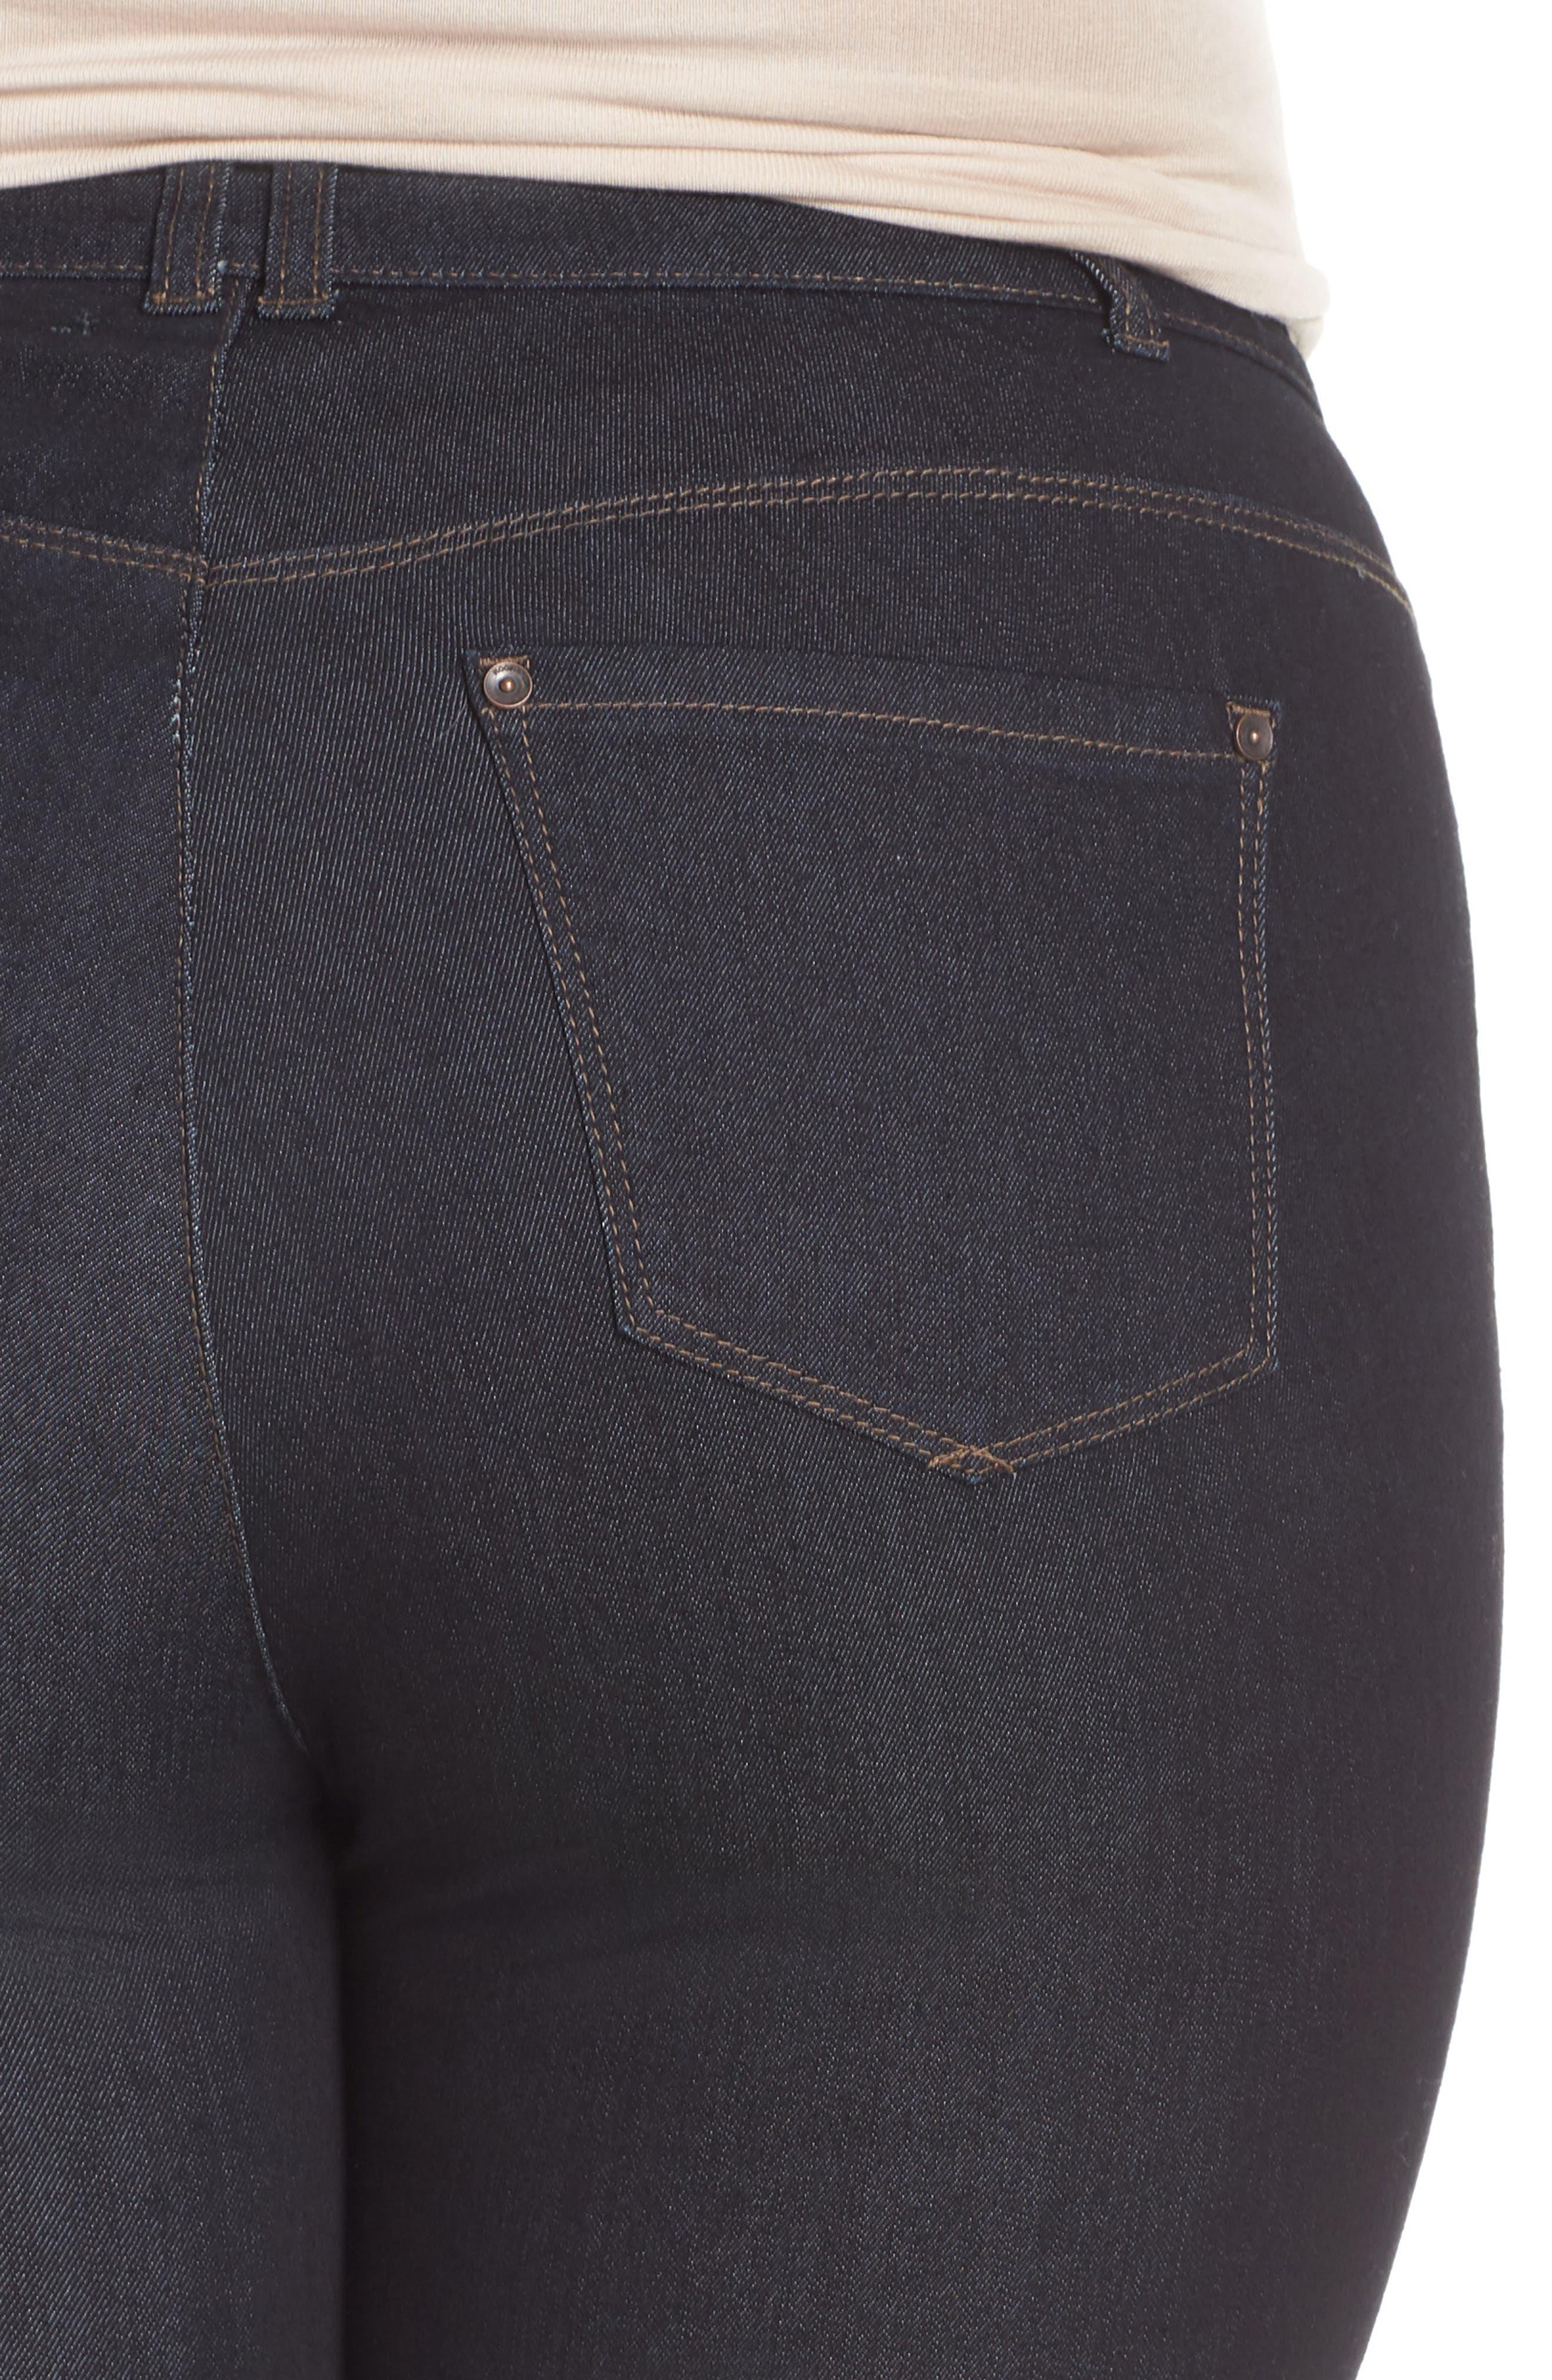 WIT & WISDOM, 30/11 Ab-solution High Waist Skinny Jeans, Alternate thumbnail 4, color, INDIGO